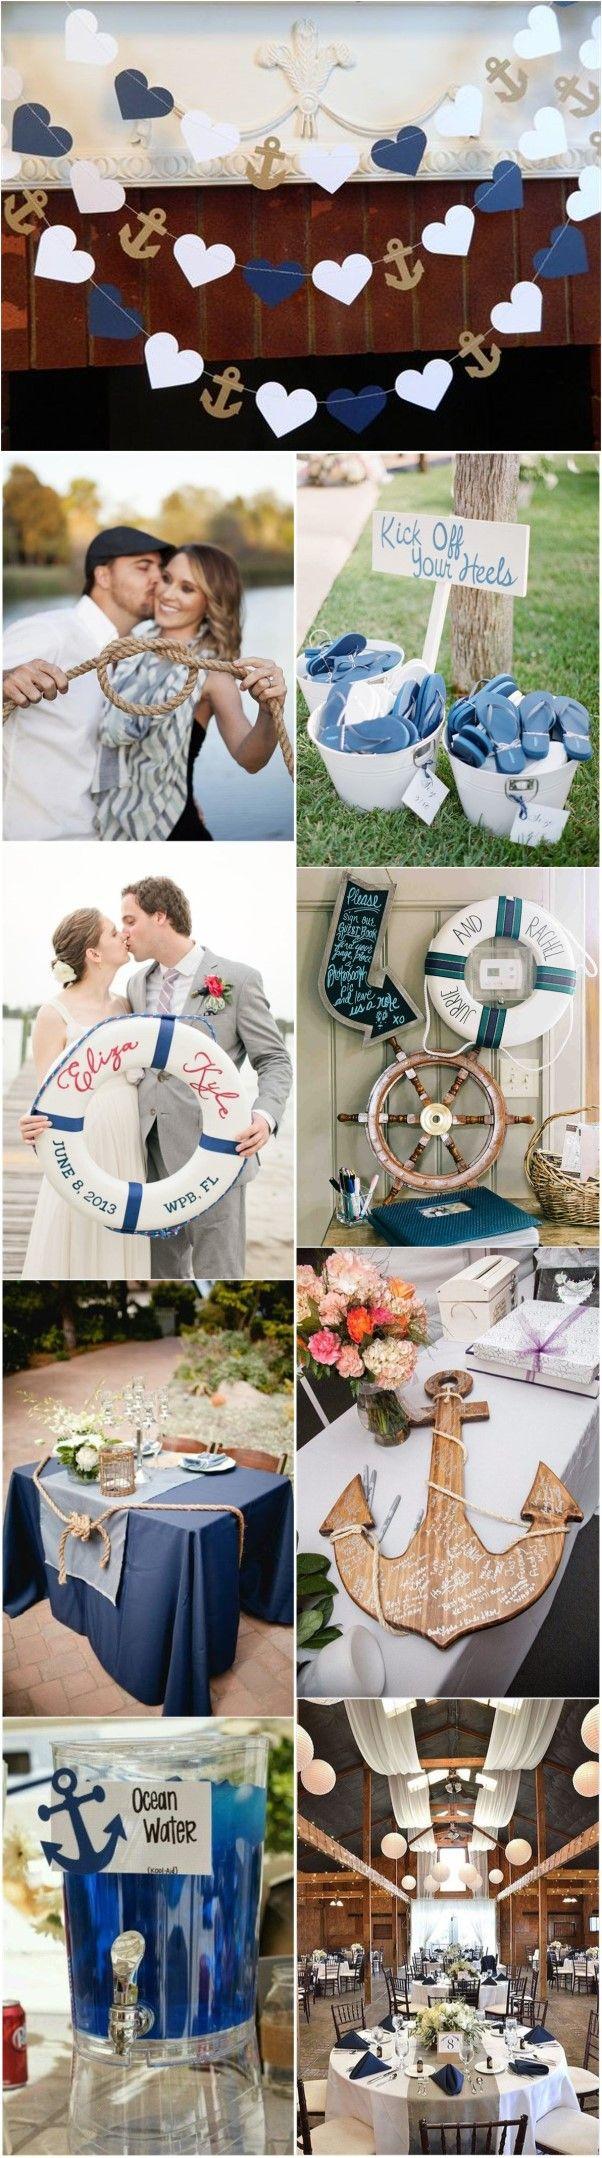 Blue and white wedding decor   best Beach Wedding Ideas images on Pinterest  Beach weddings